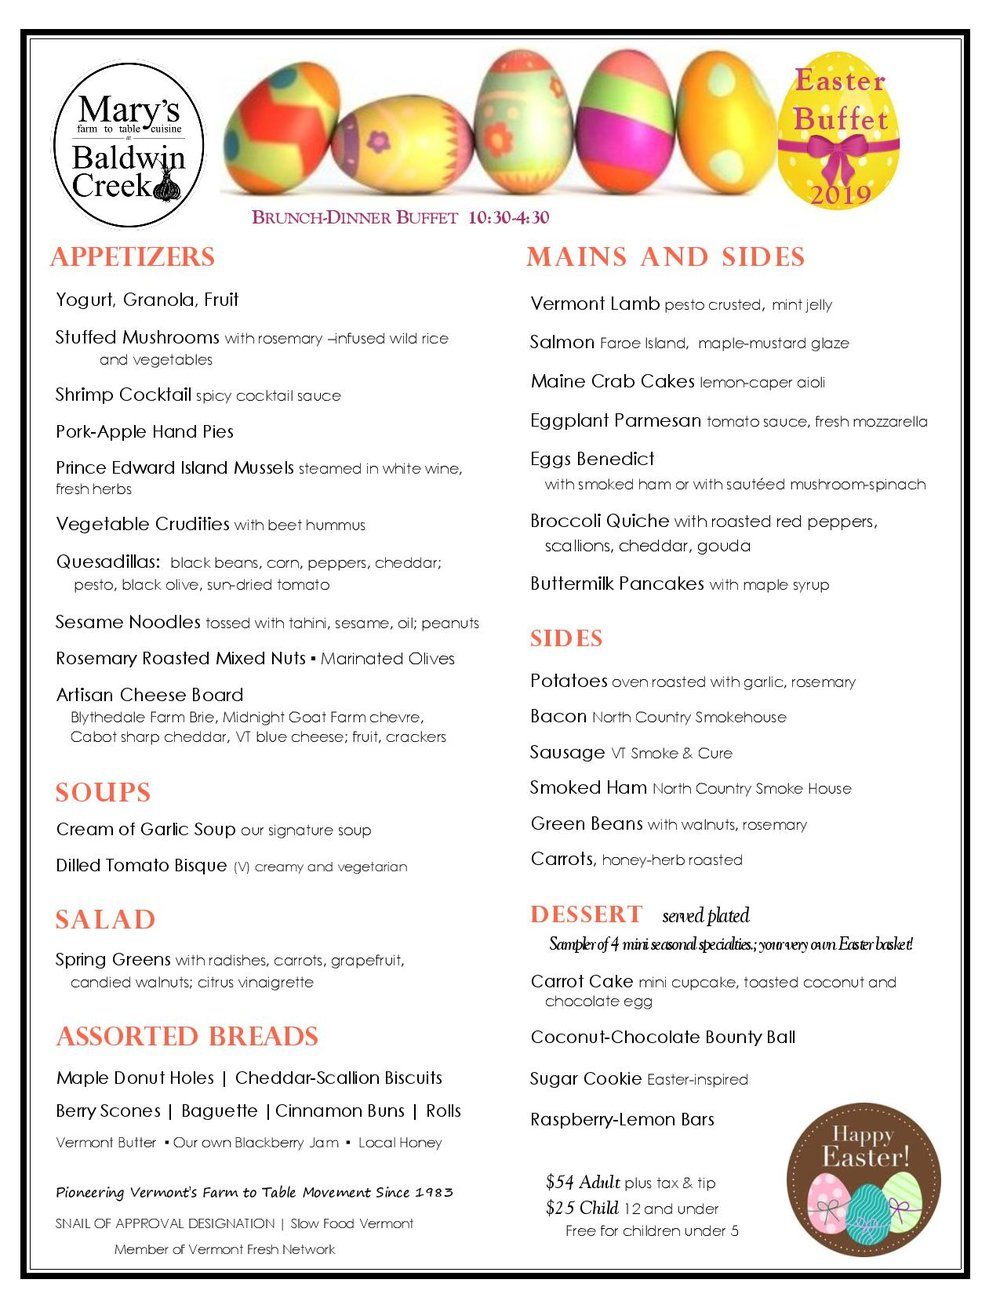 Easter 2019 Brunch-Dinner Buffet-page-001.jpg